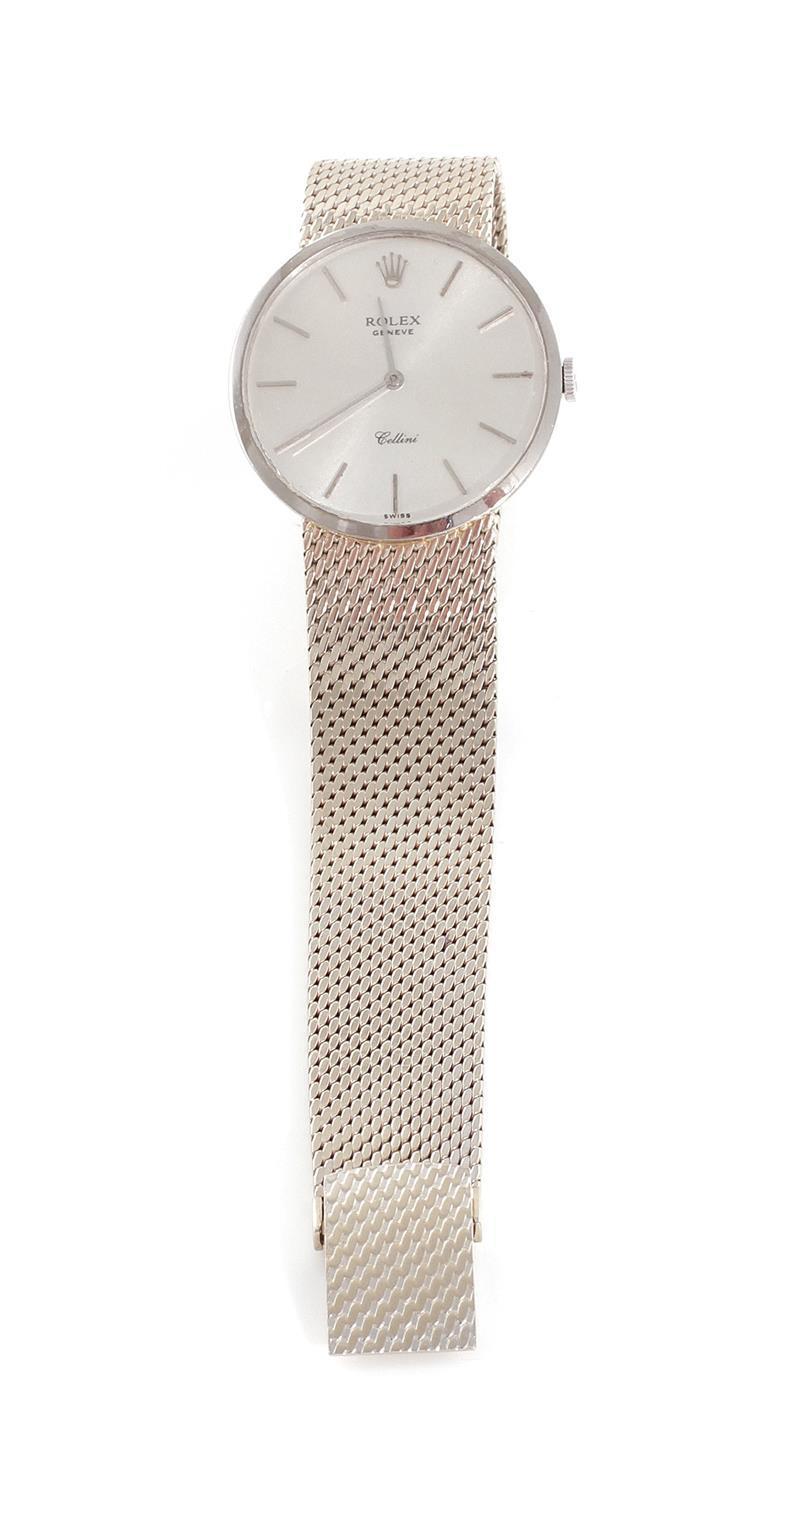 Rolex white gold Cellini wristwatch